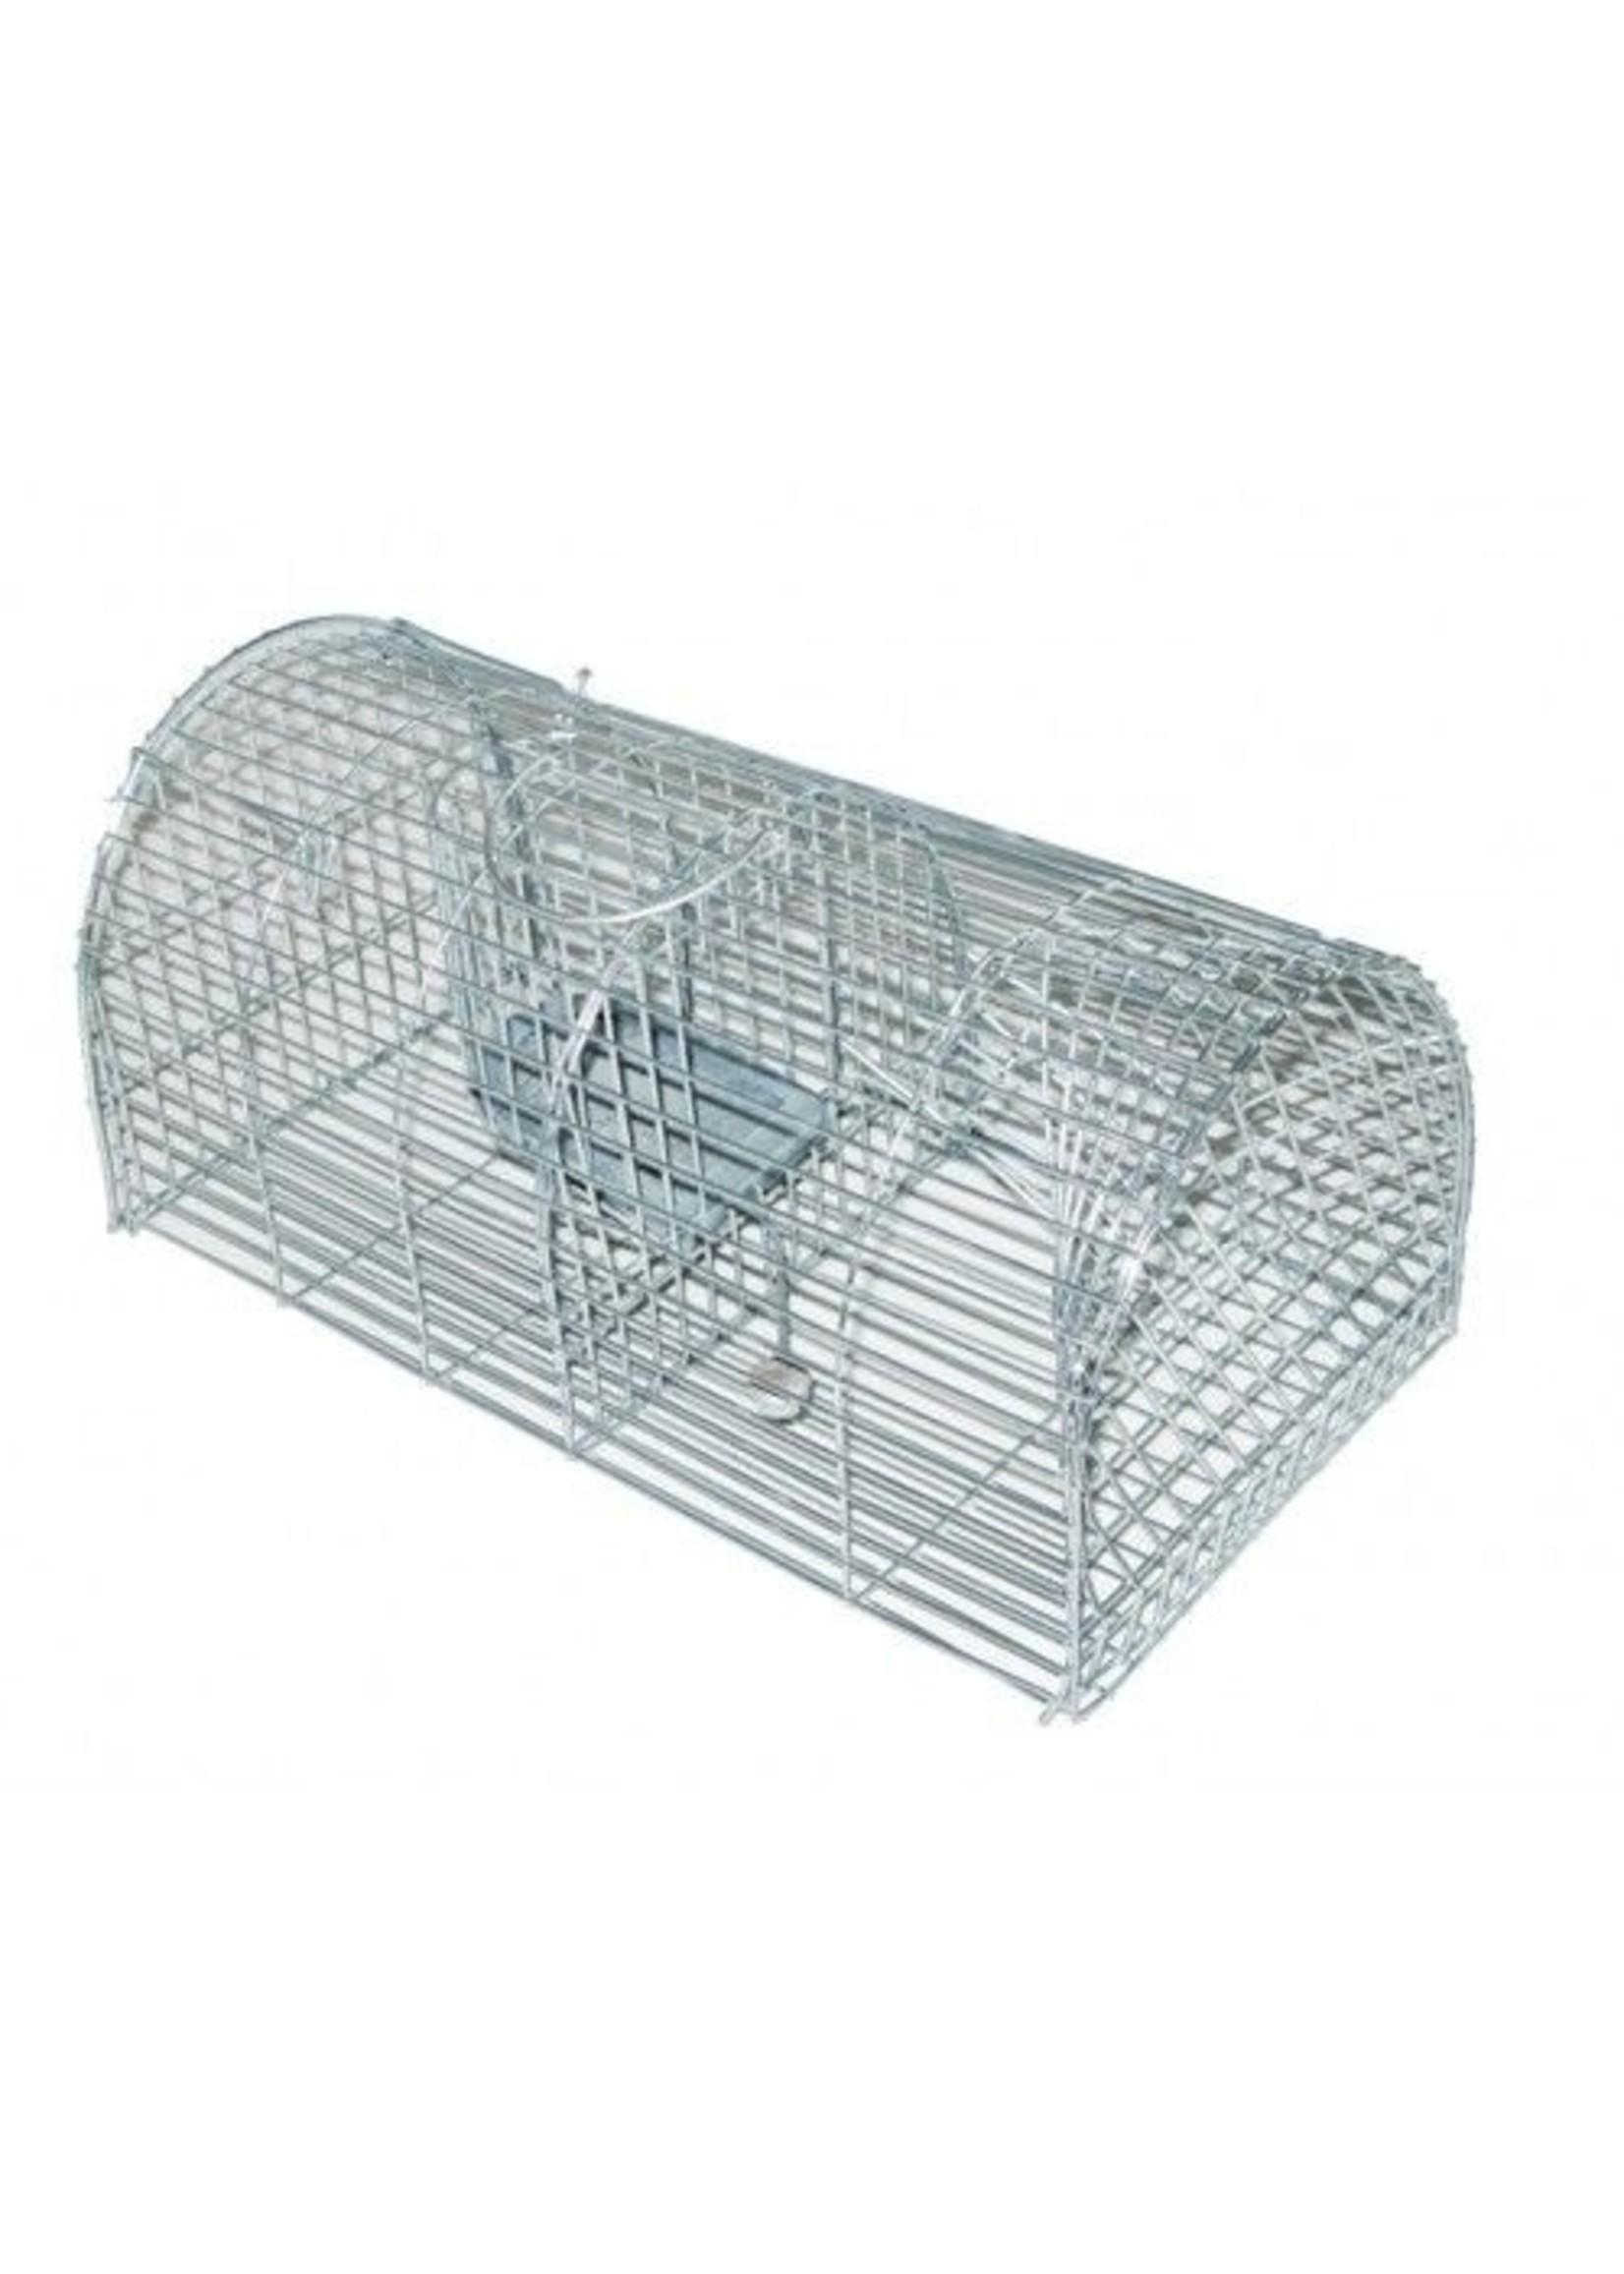 Luxan levend vangende rattenvangkooi